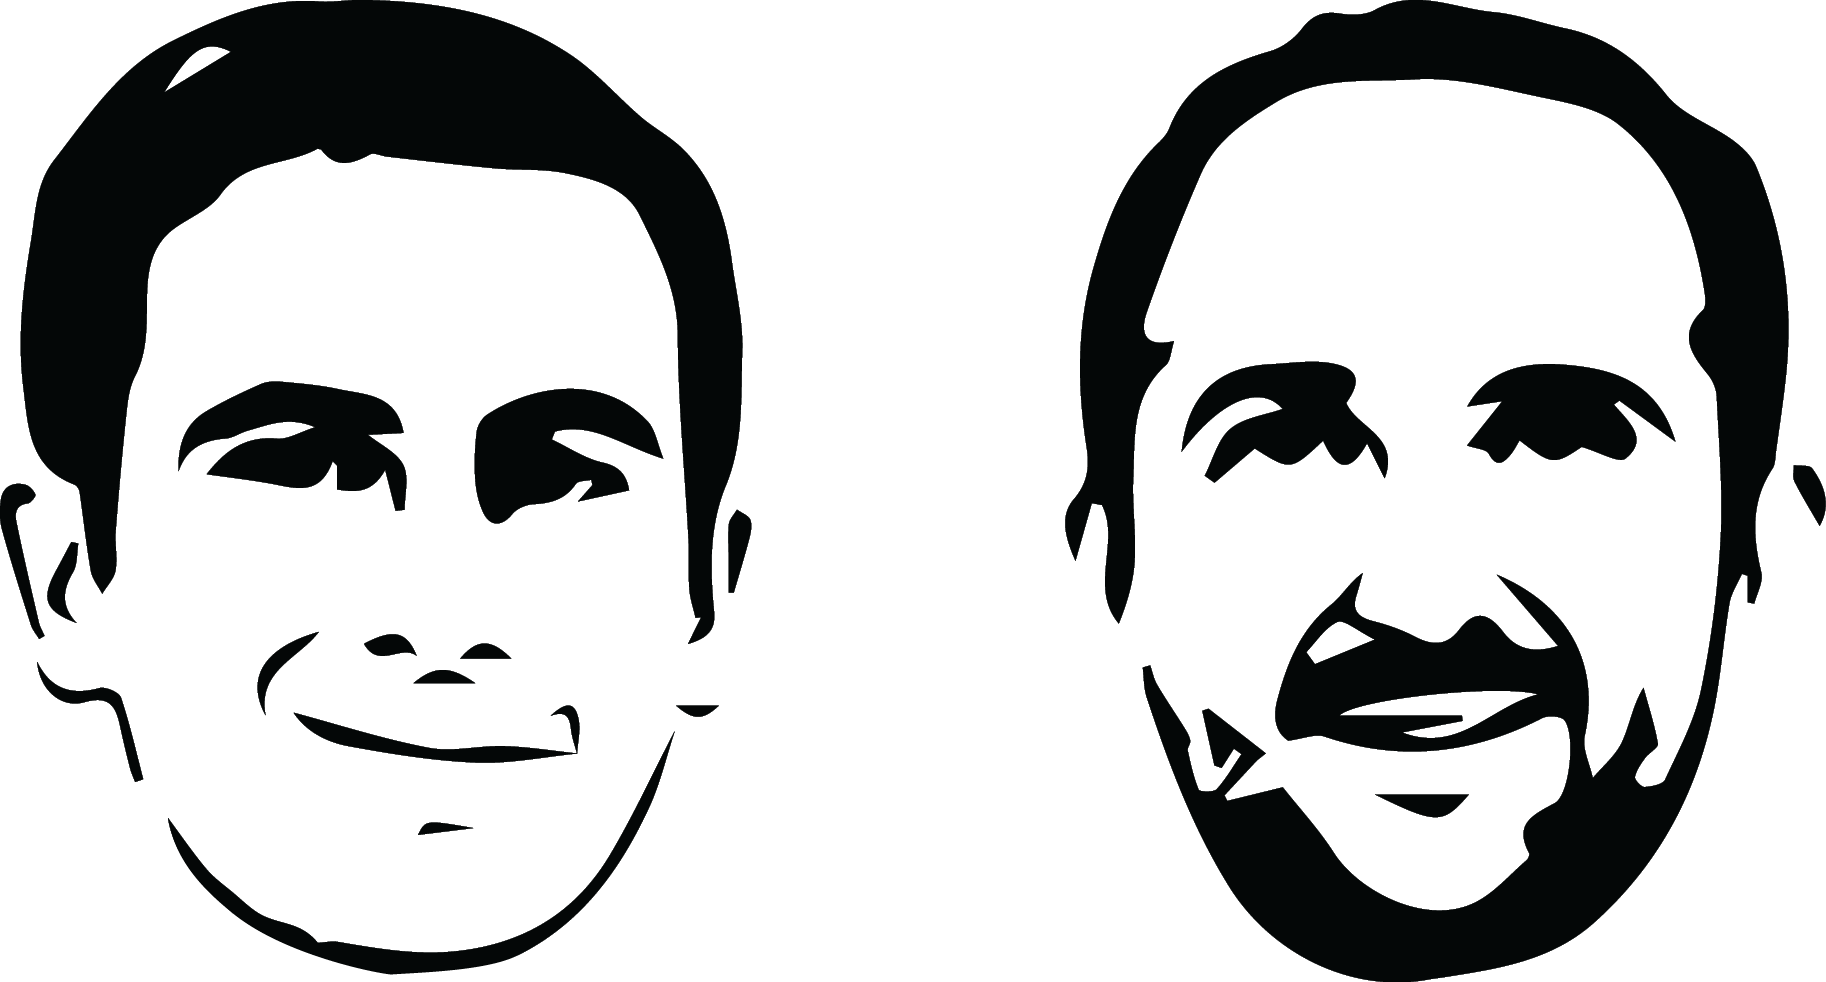 DE_Daan_Tech_founders_heads_black